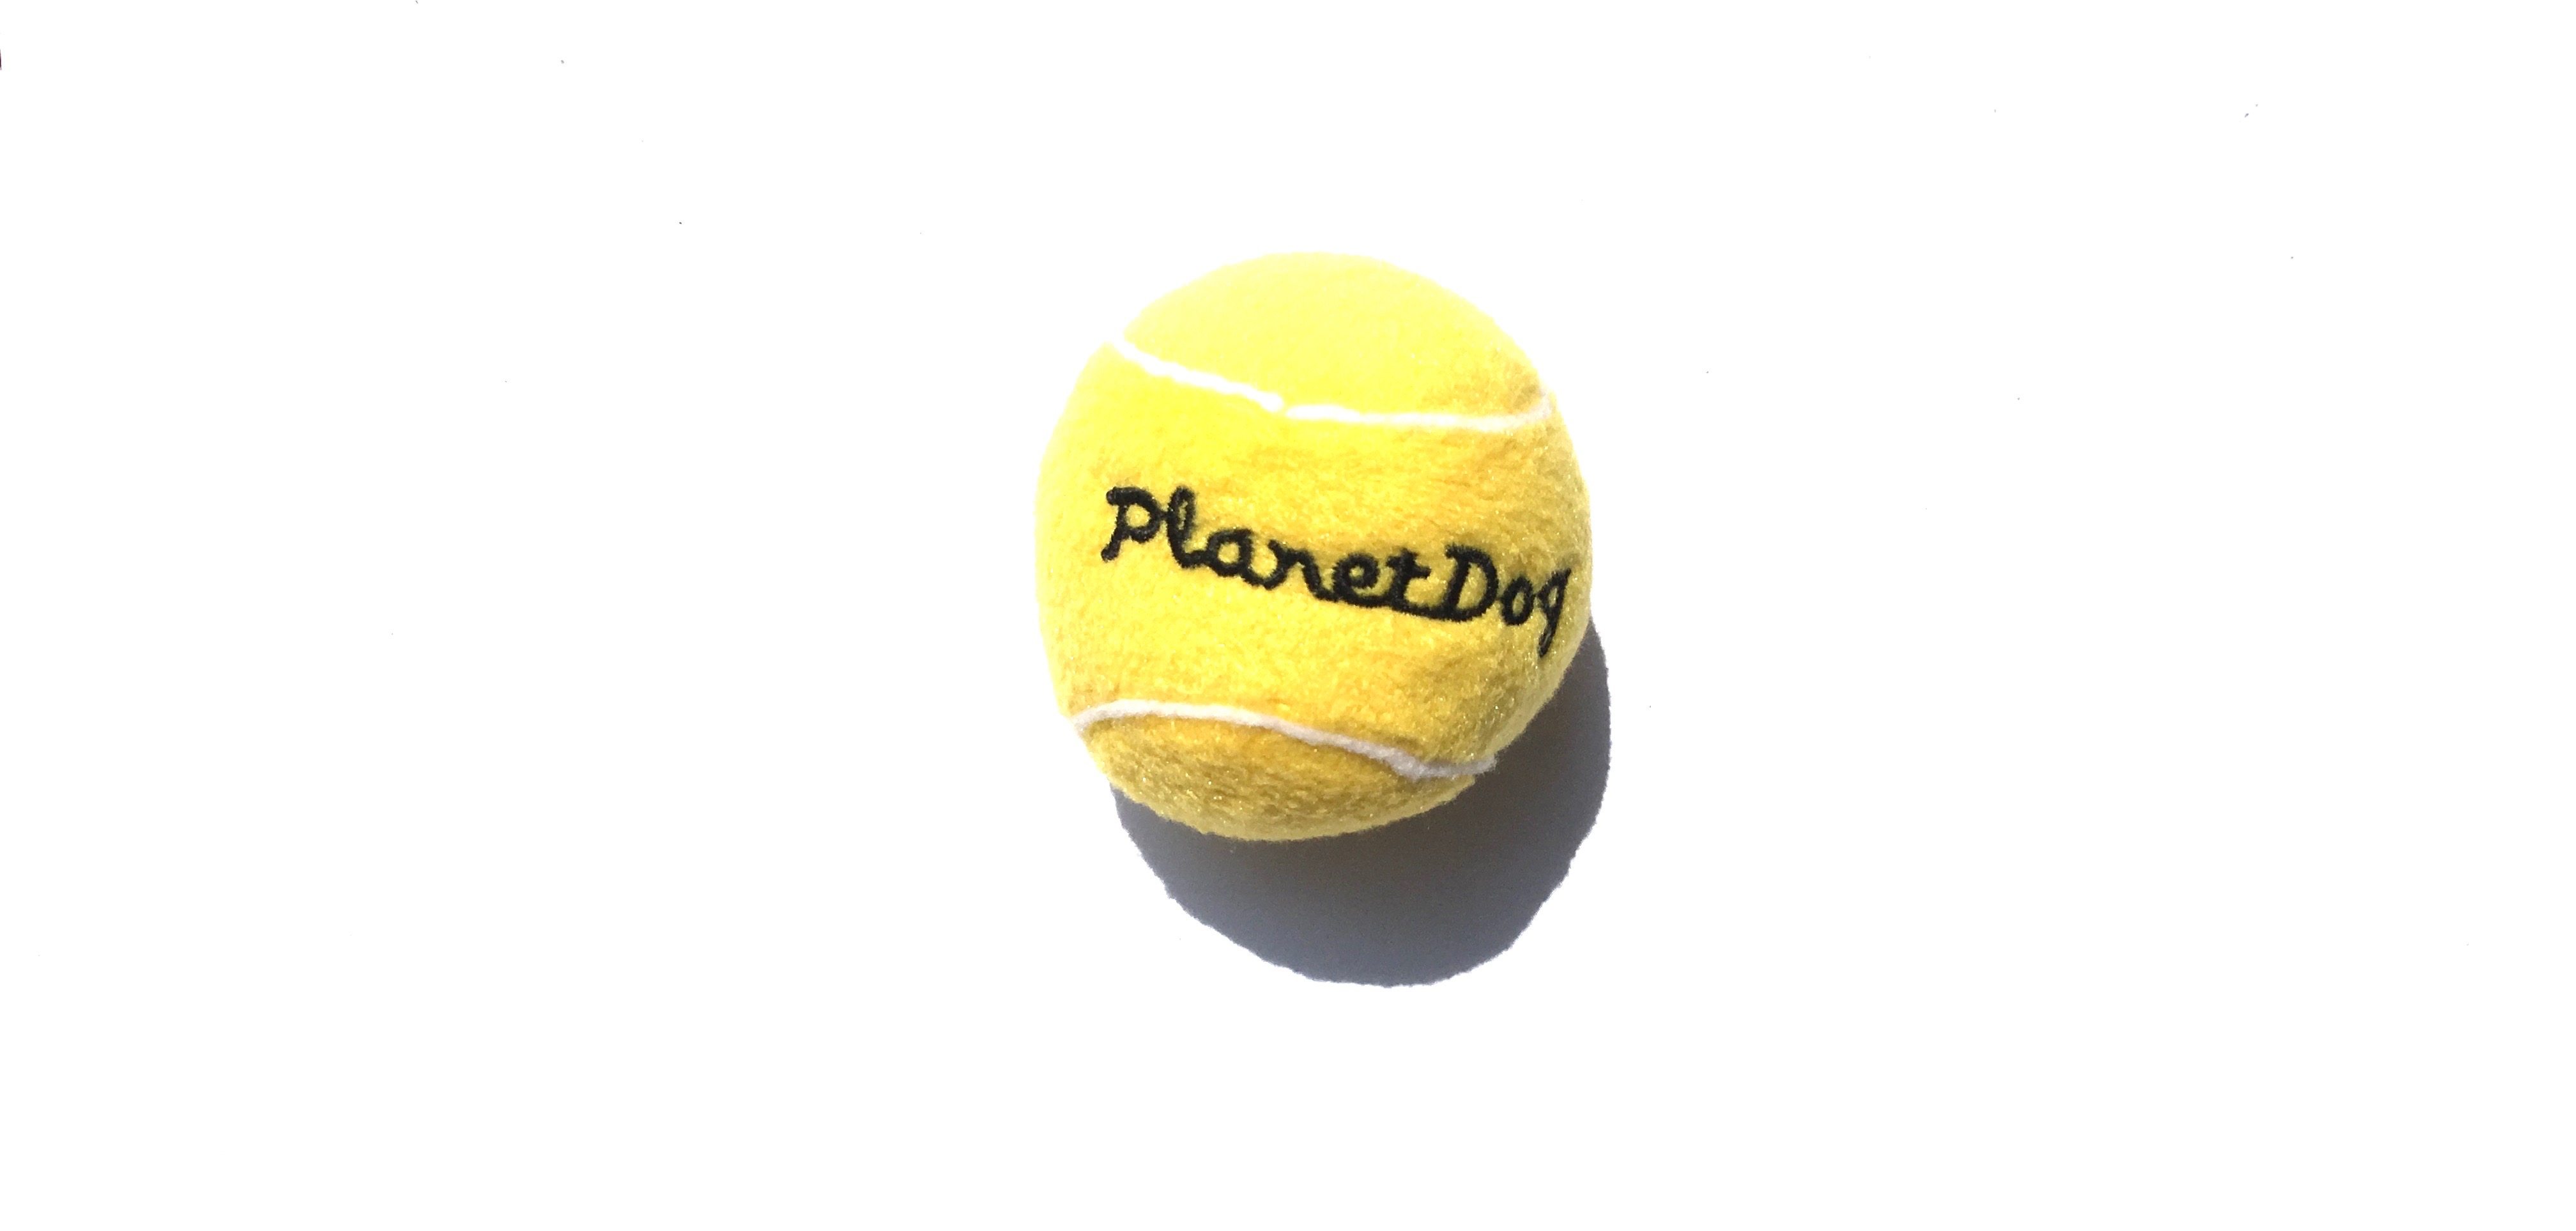 PLANET DOG squeaky  プラネットドッグ スクイークトーイ テニスボール_d0217958_1282166.jpg